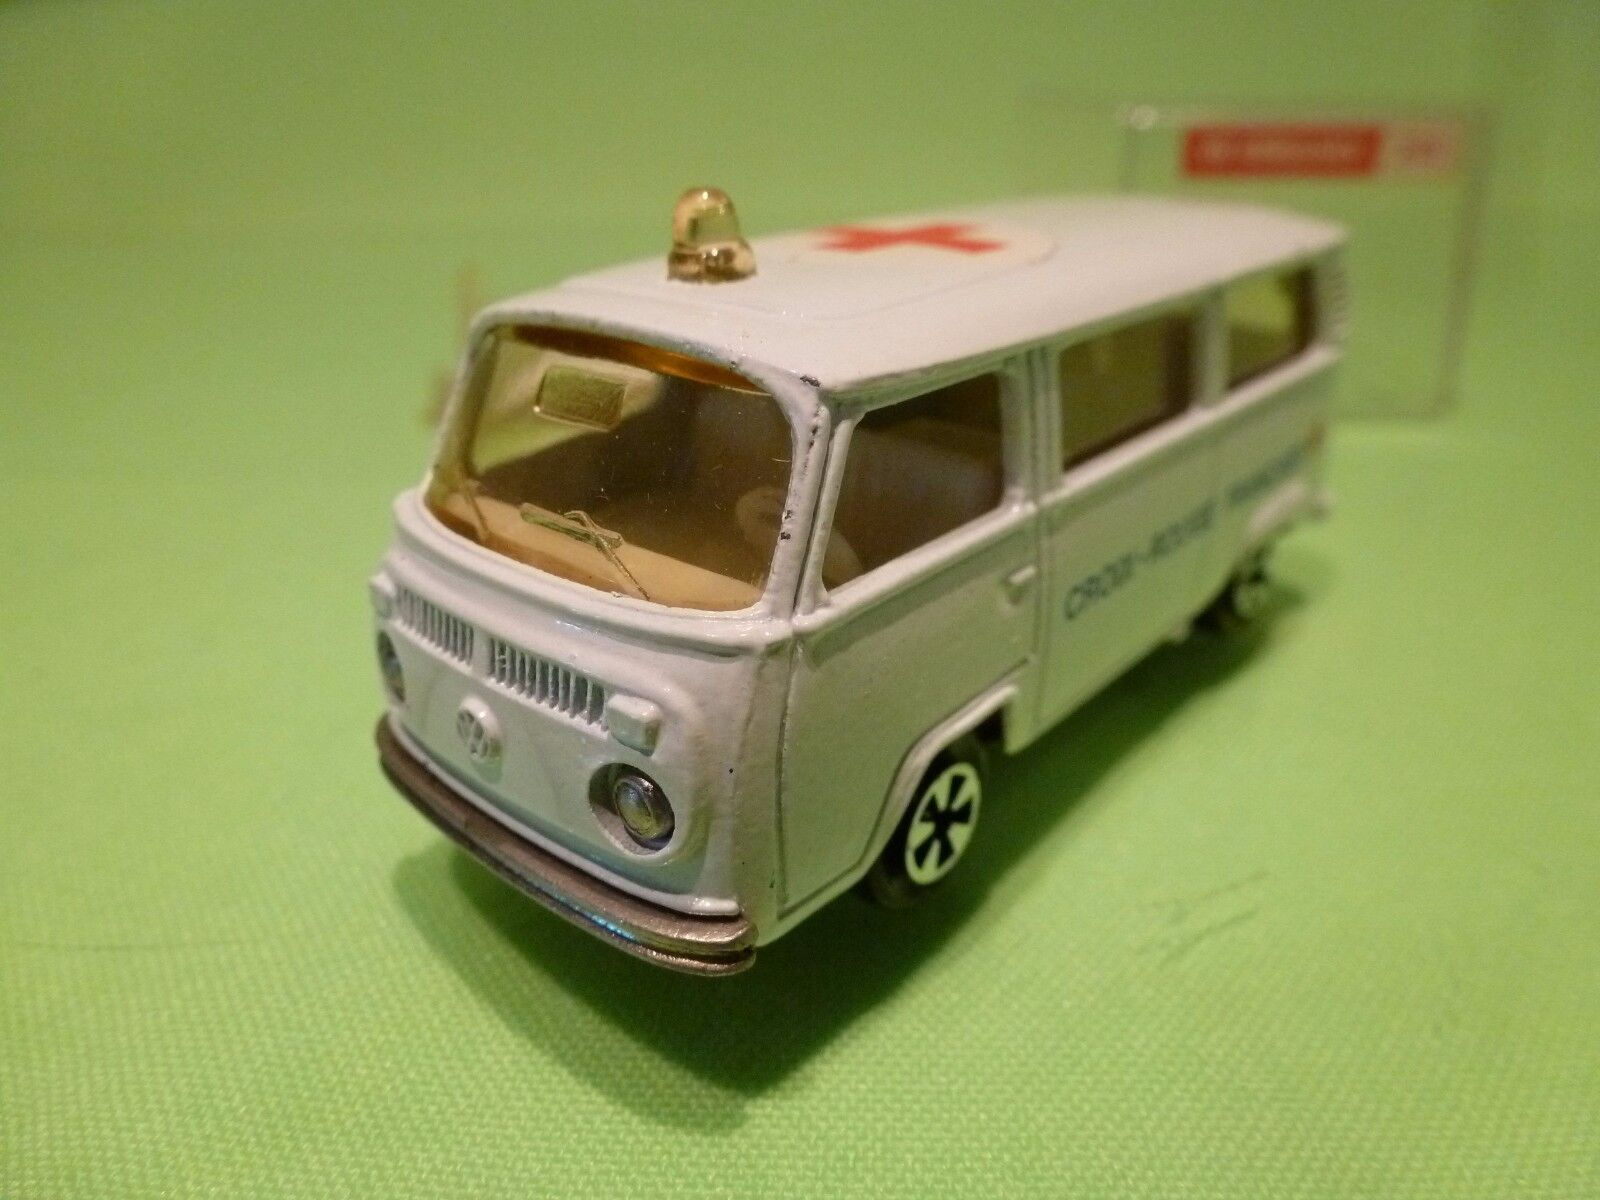 MAJORETTE 244  VW VOLKSWAGEN T2 T2 T2 AMBULANCE - WHITE 1 60 - VERY GOOD IN BOX 957cc4